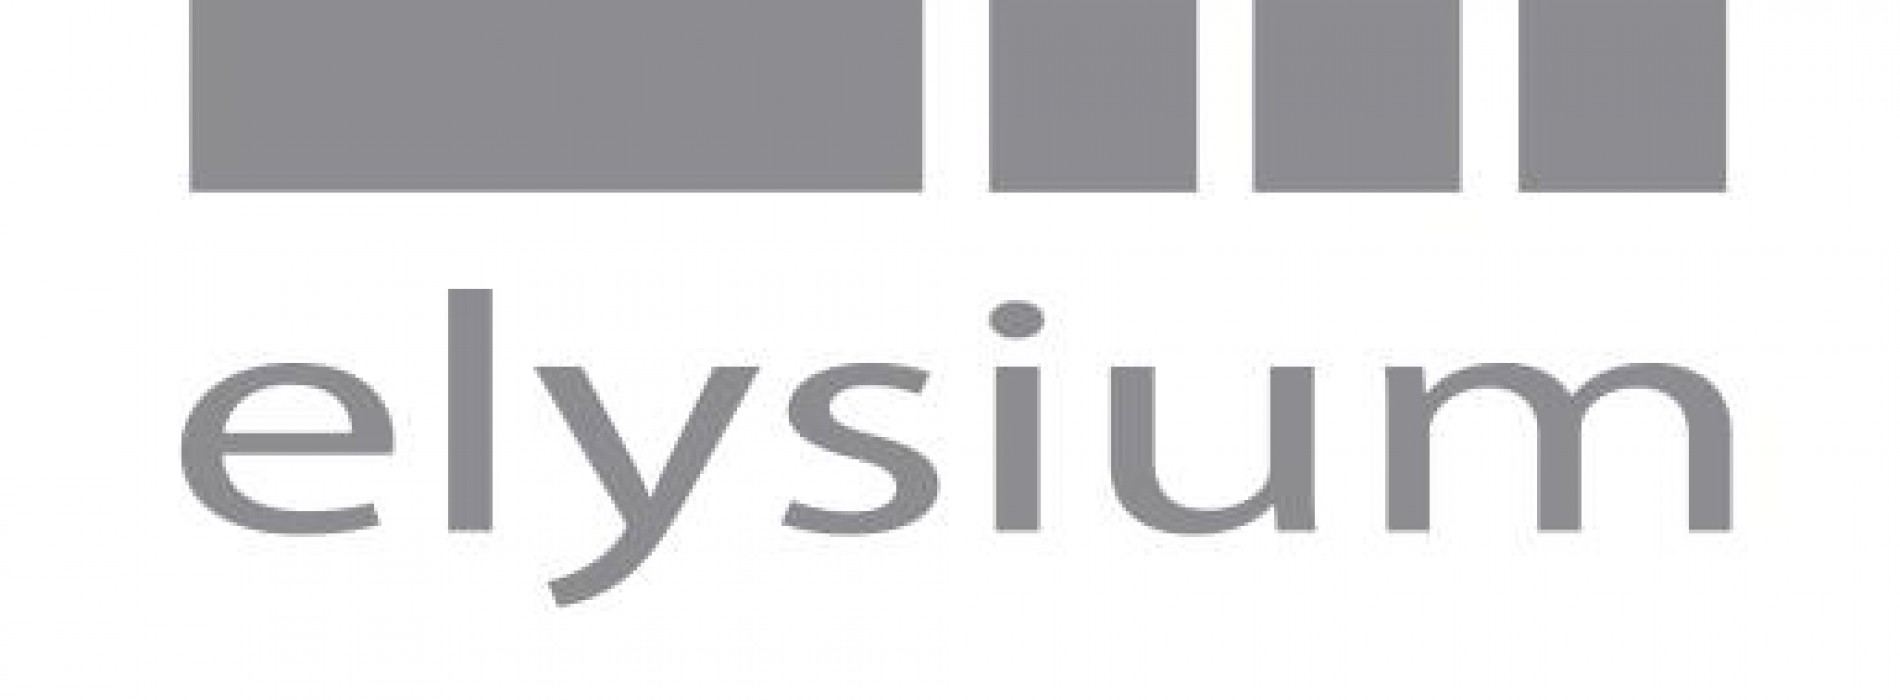 Elysium – Etho Enakkul Is Out